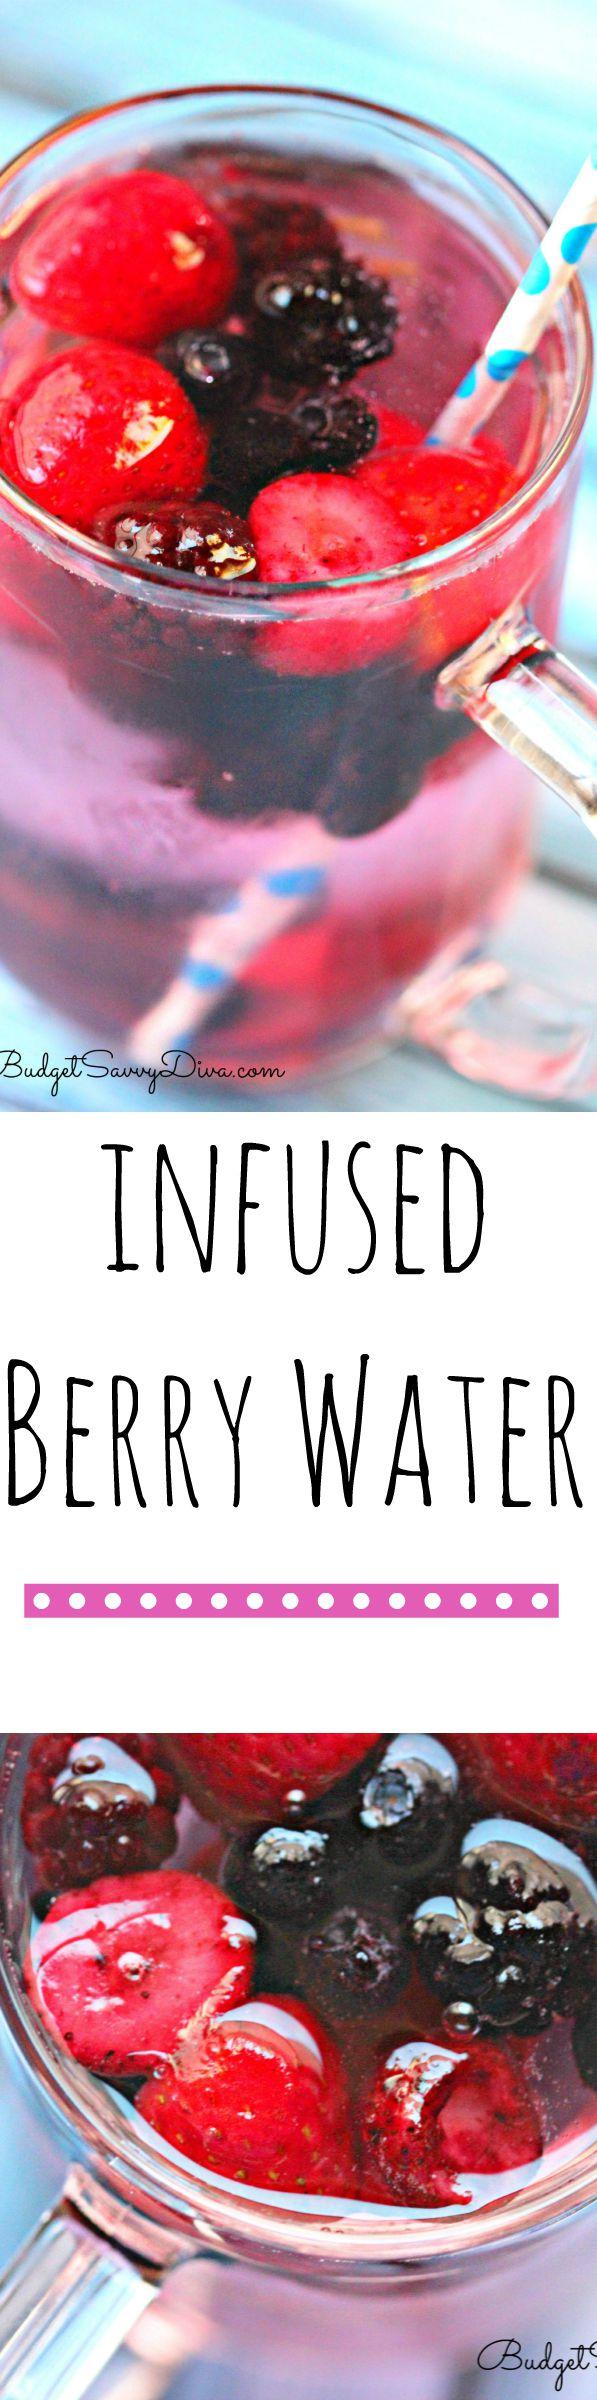 Berry Water FINAL